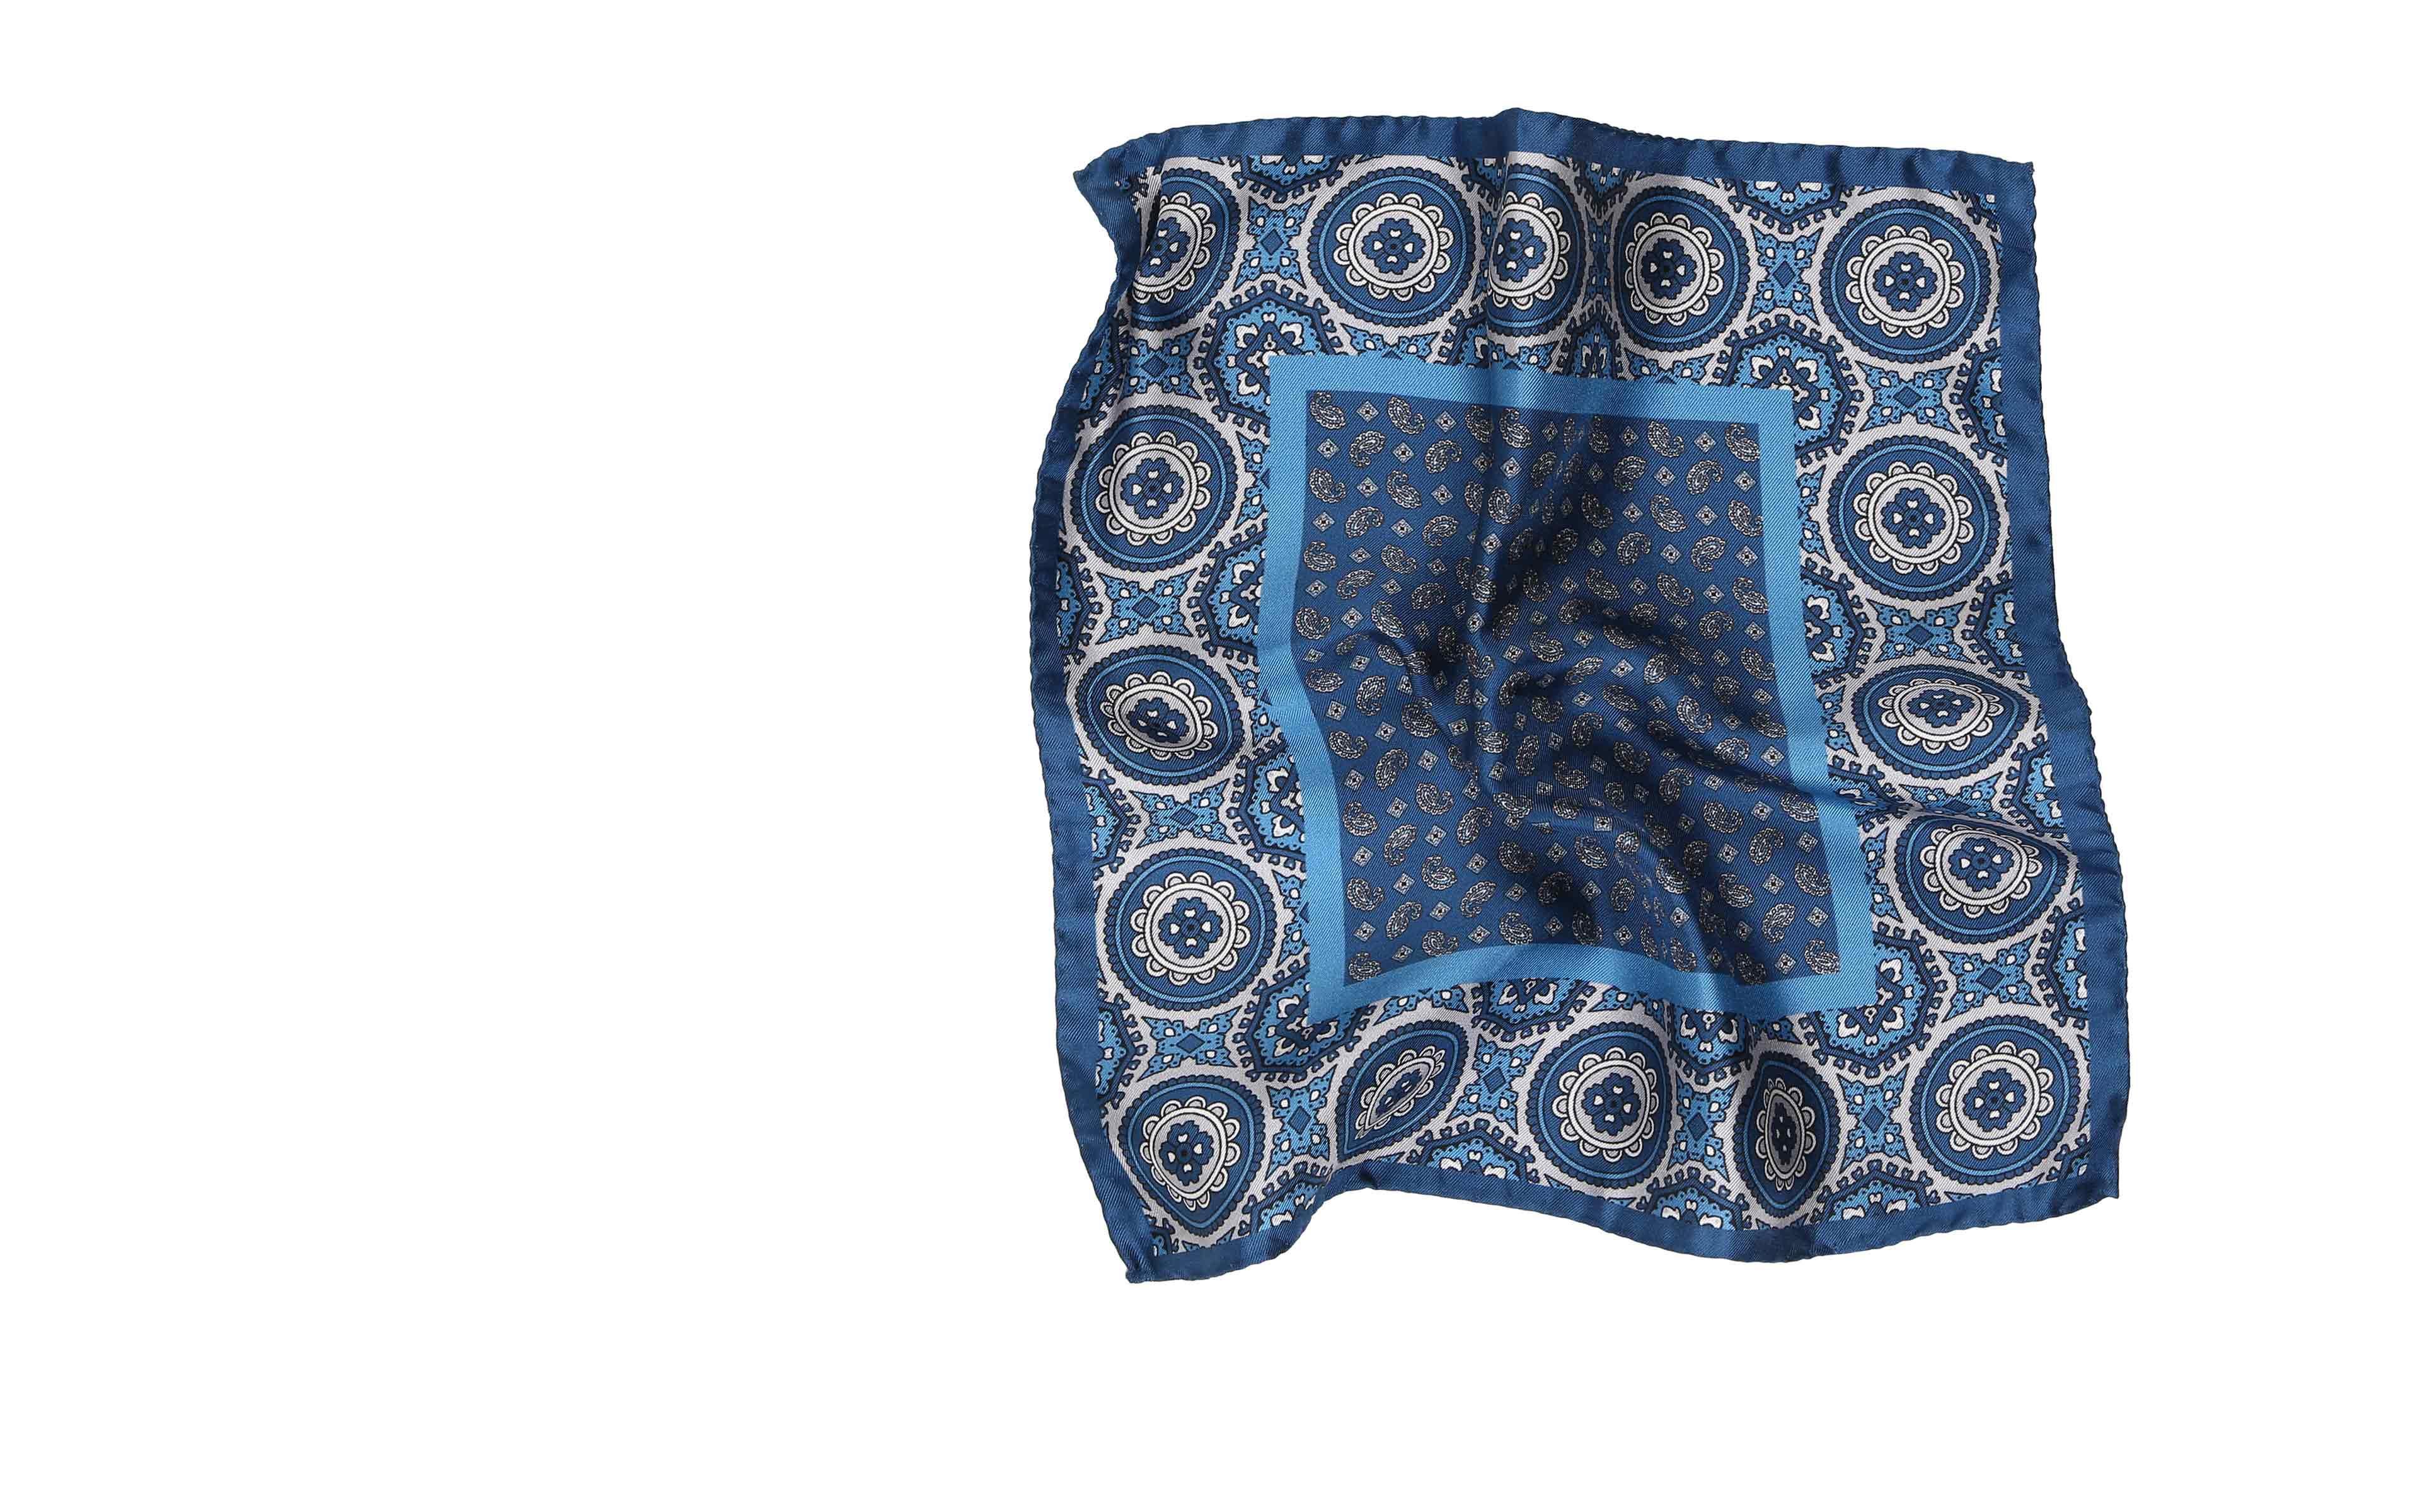 Steel Blue & Silver Italian 100% Silk Pocket Square